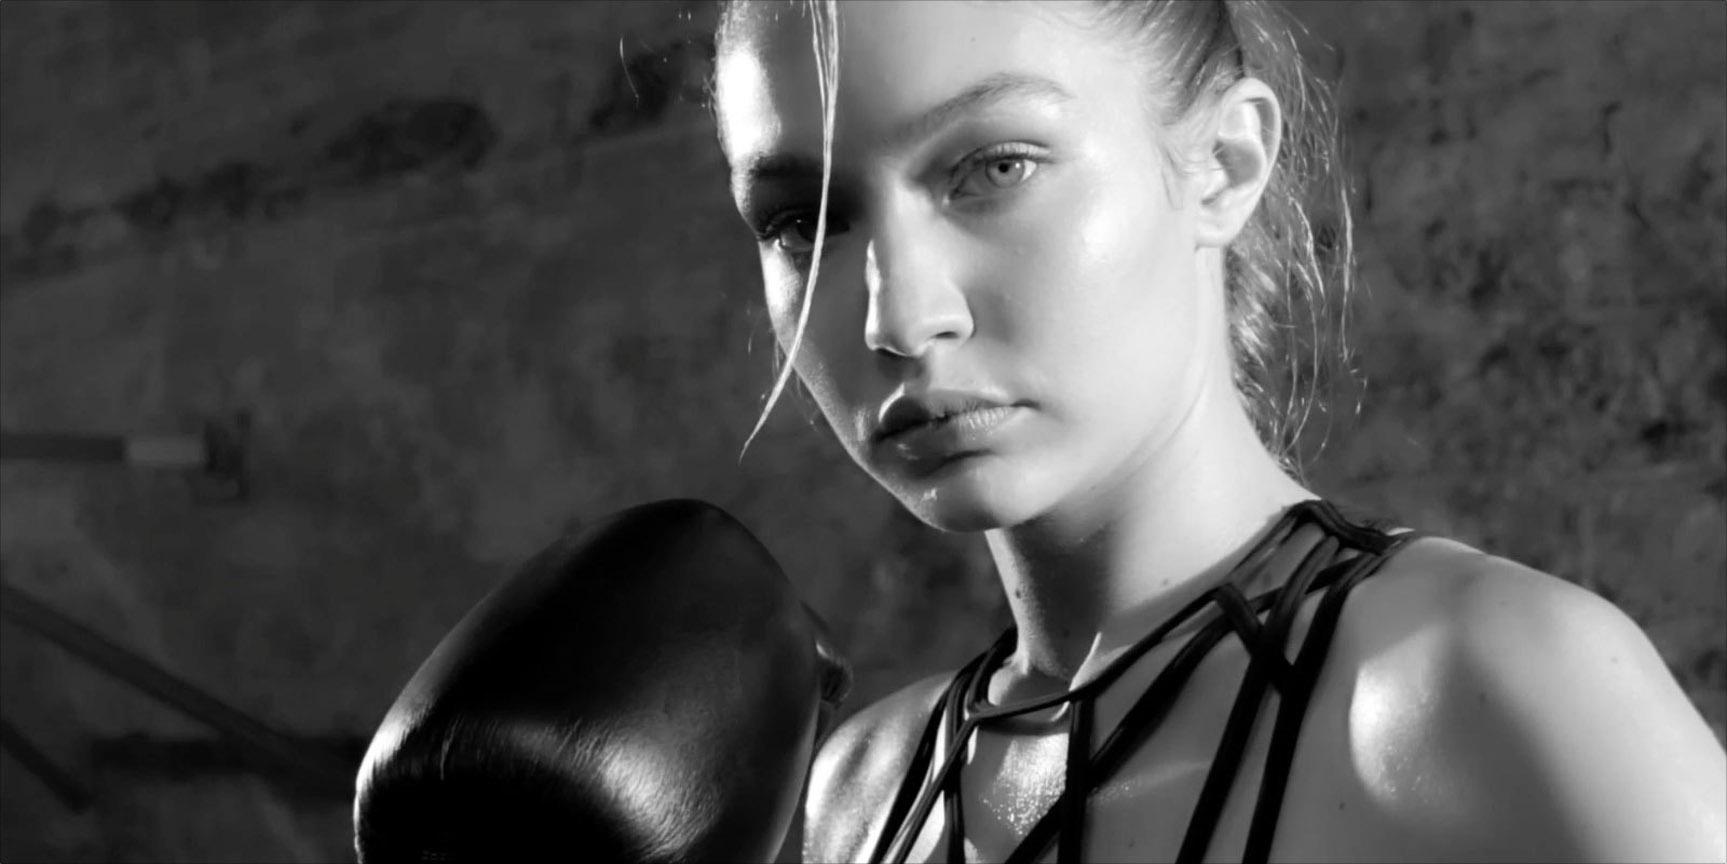 Джиджи Хадид в рекламной кампании Reebok 2016/2017 - Gigi Hadid by Cathrine Wessel